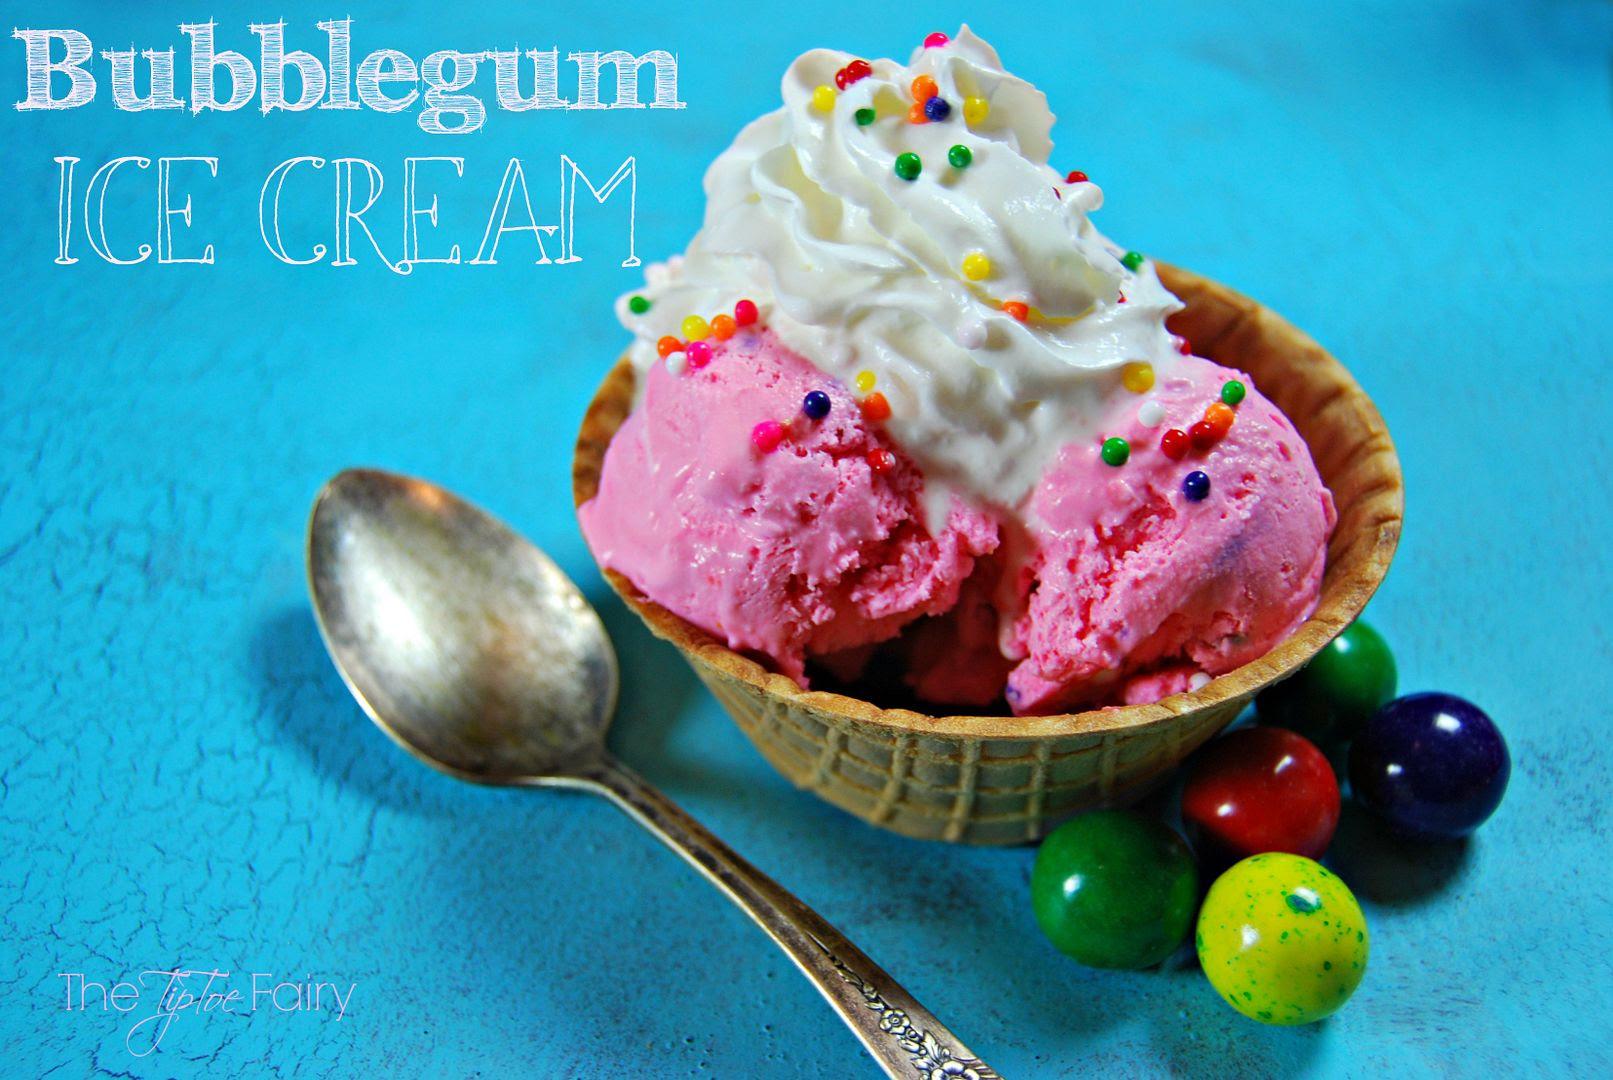 Bubblegum Ice Cream by The Tiptoe Fairy